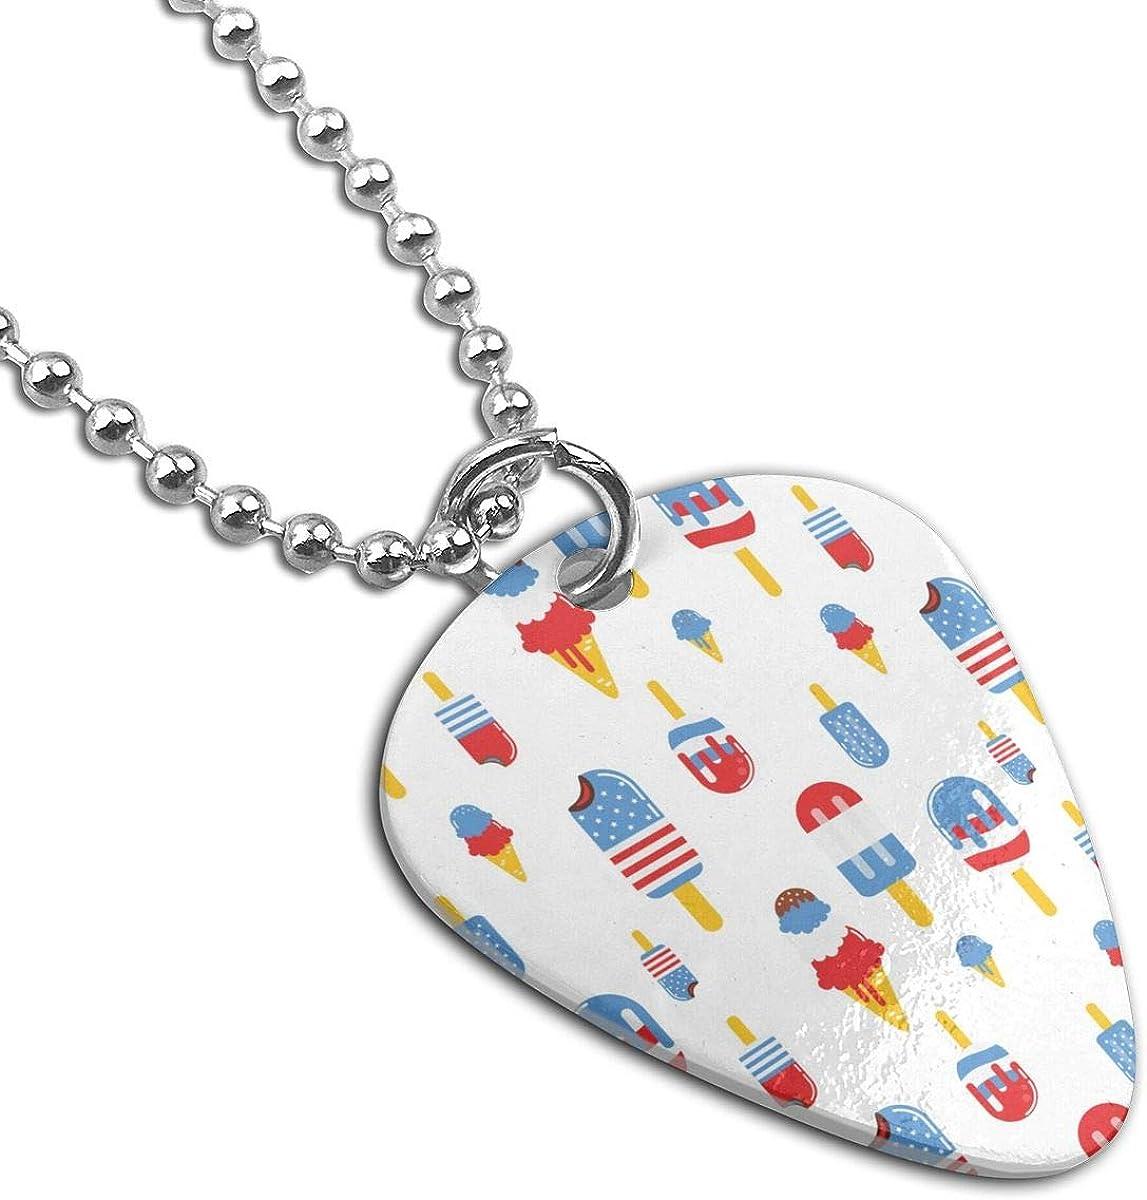 USA Patriotic Ice Cream Custom Guitar Pick Pendant Necklace Keychain